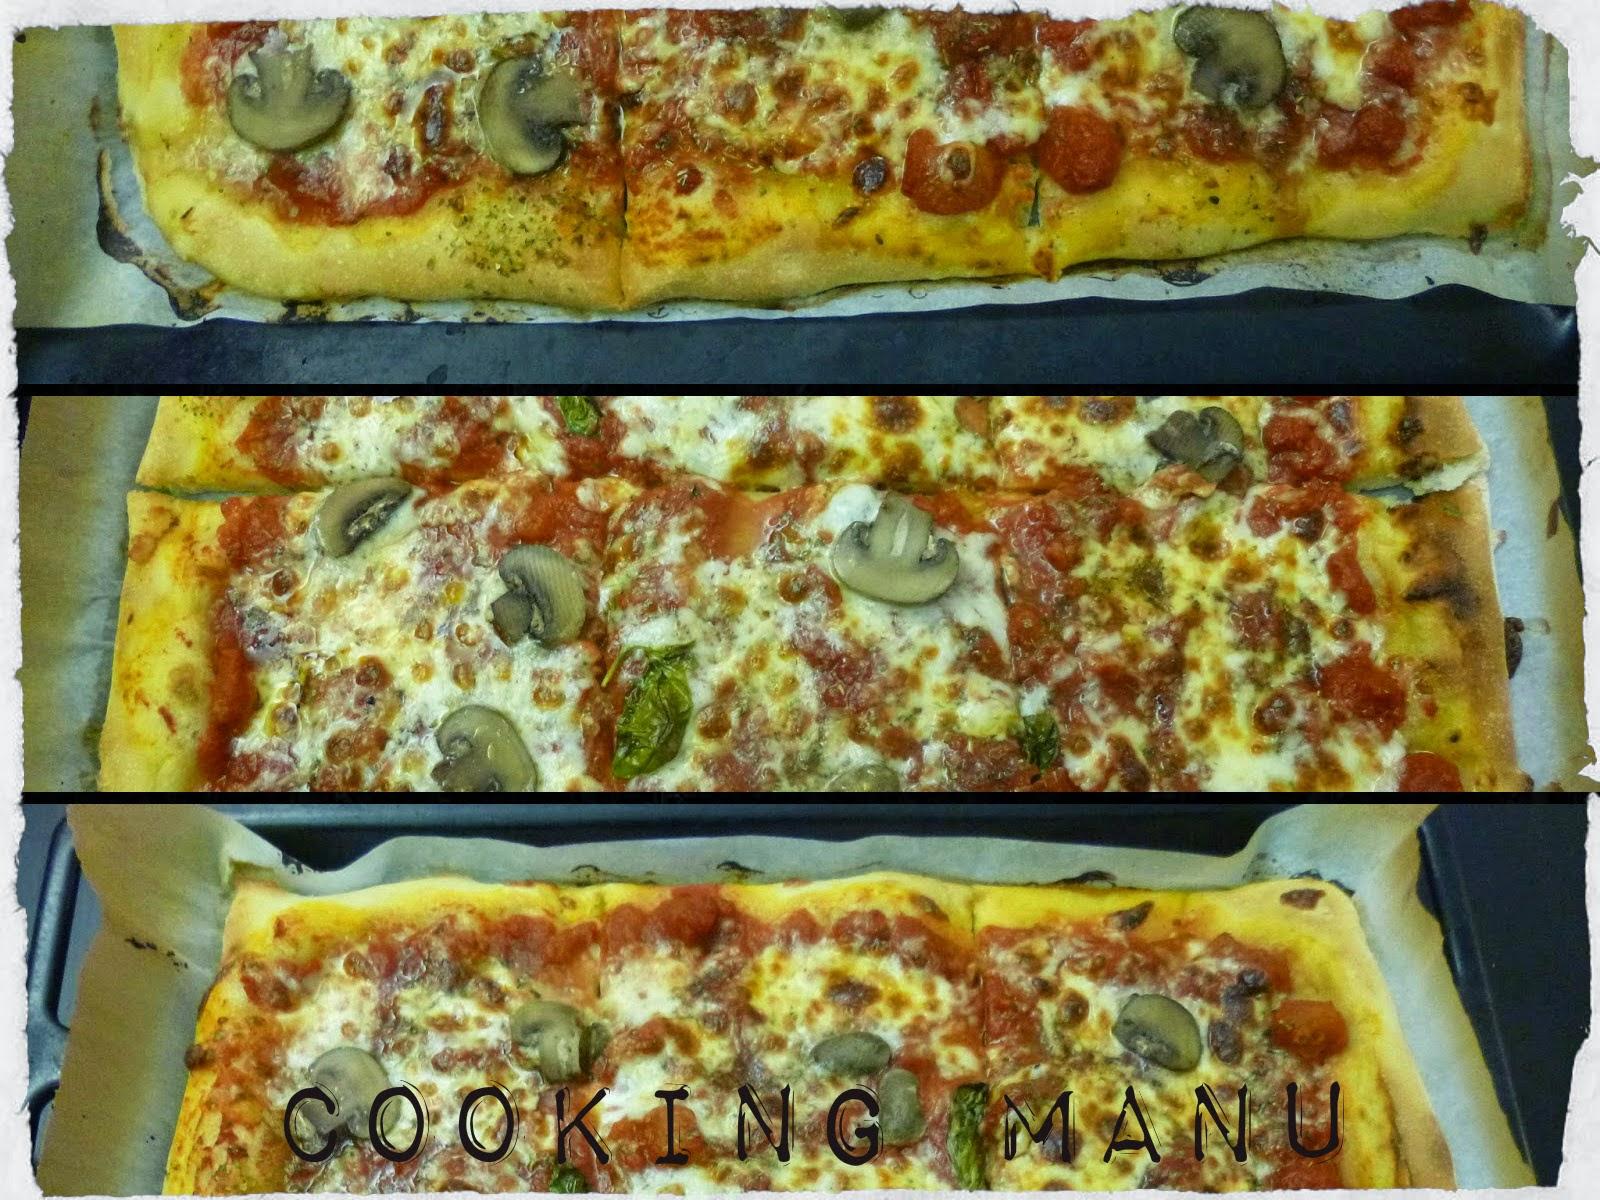 pizza e funghi (pizza with mushrooms)